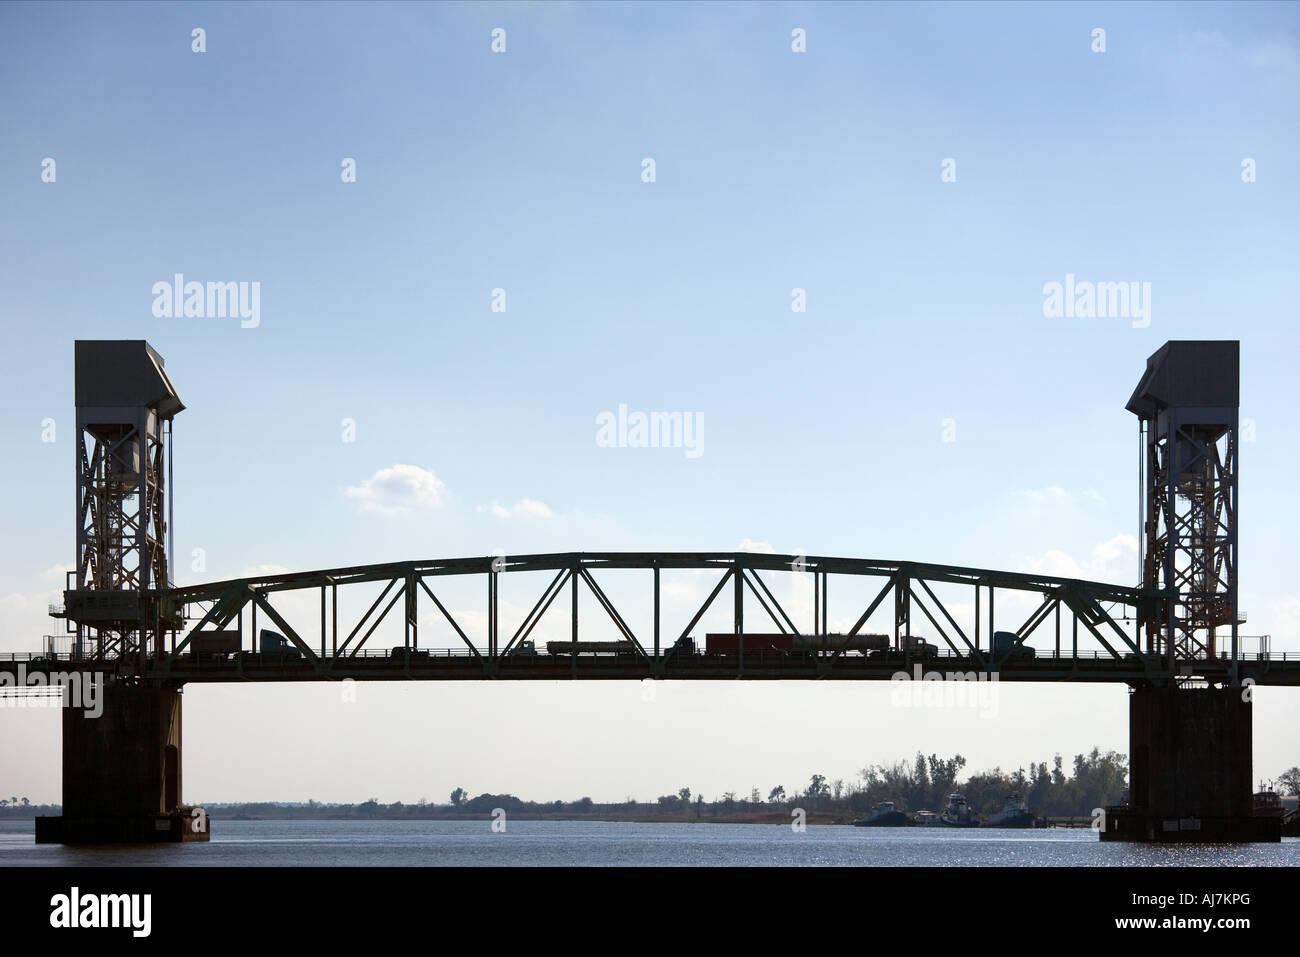 https://c7.alamy.com/comp/AJ7KPG/cape-fear-memorial-bridge-wilmington-north-carolina-nc-usa-cape-fear-AJ7KPG.jpg